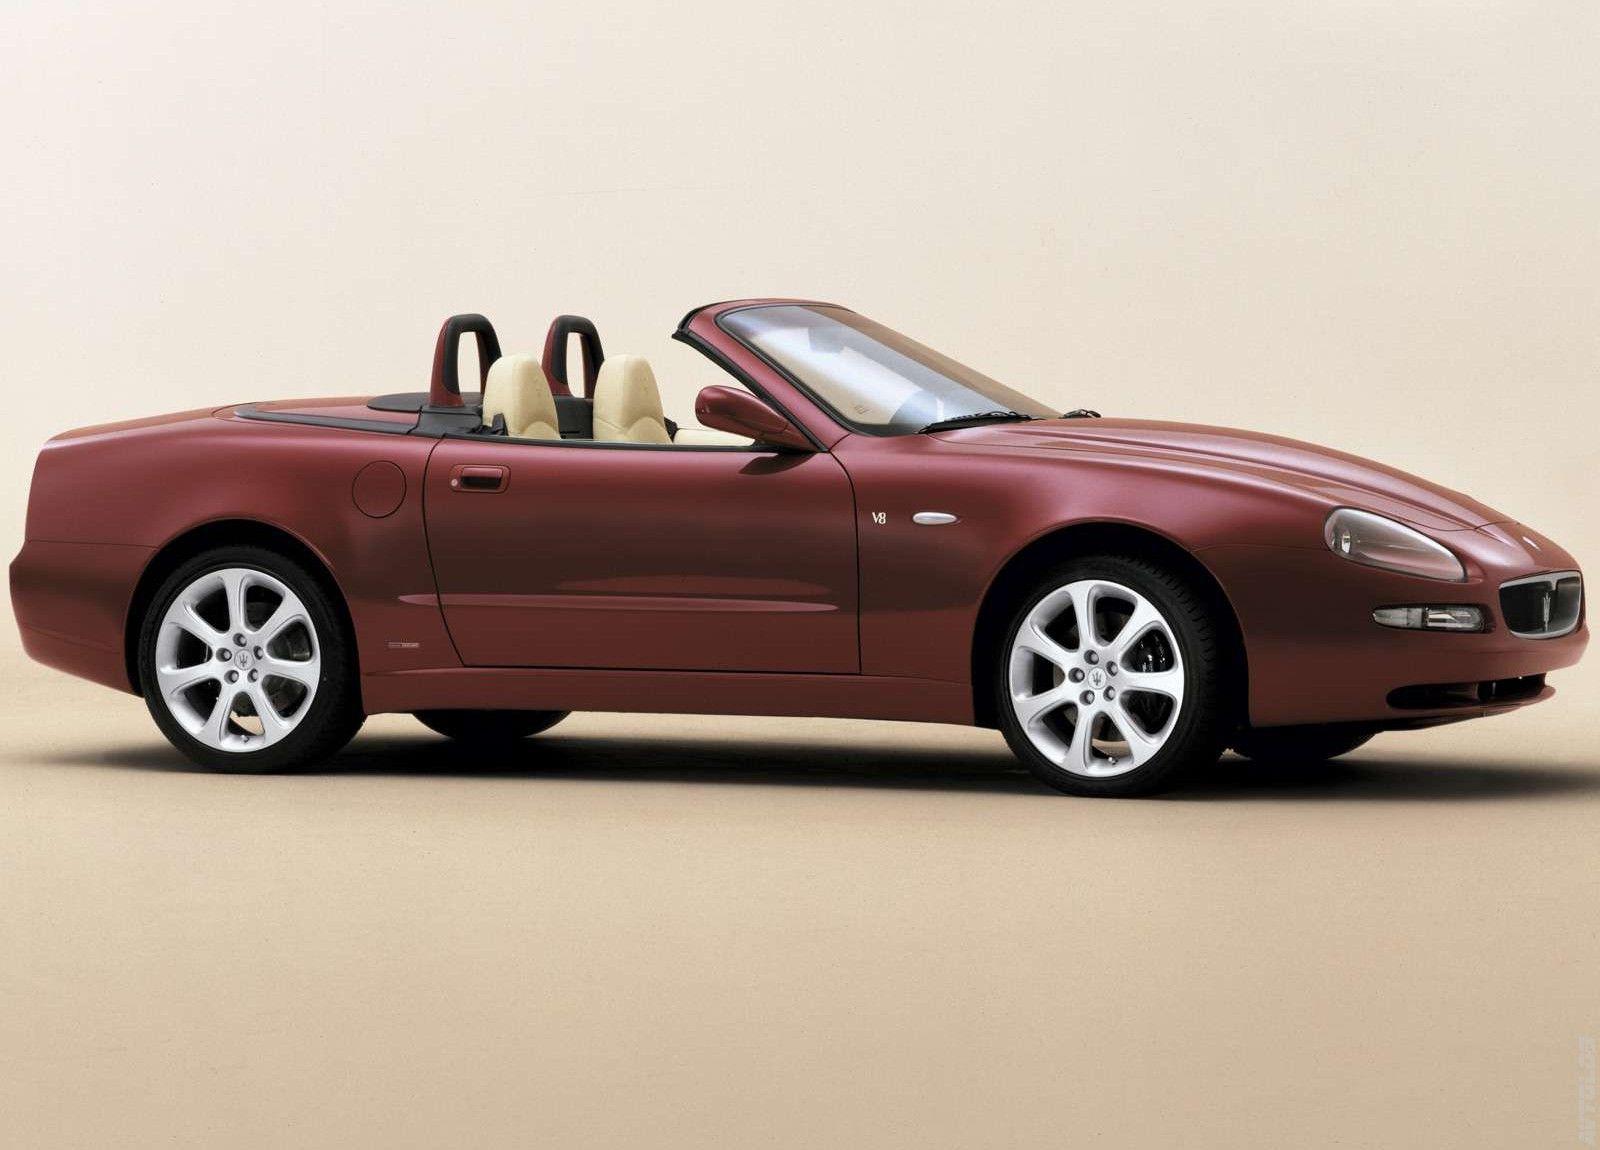 2003 Maserati Spyder | Fiat chrysler automobiles, Sports ...